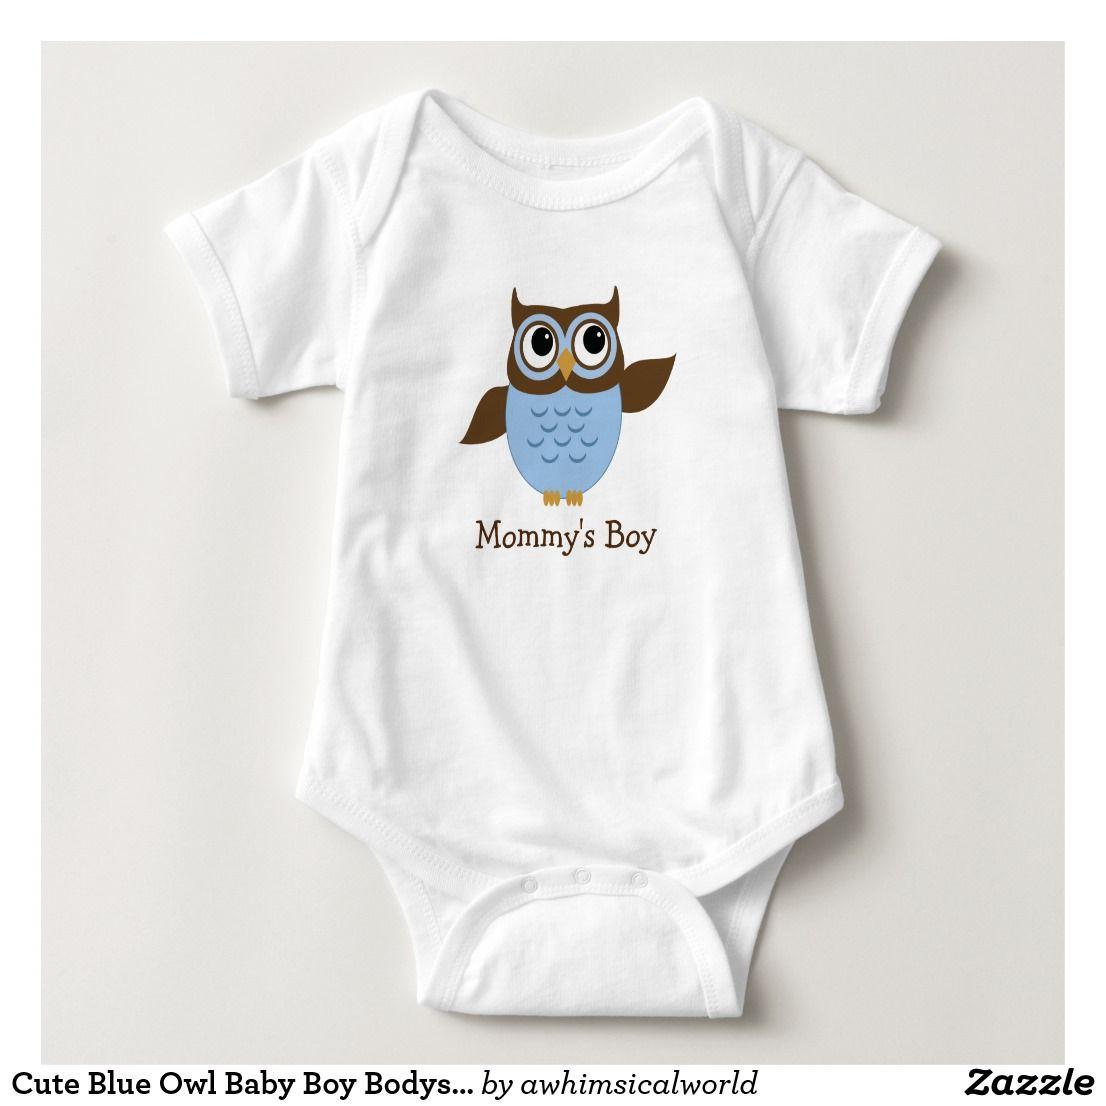 2a1e209ac Cute Blue Owl Baby Boy Bodysuit | Zazzle.com in 2019 | All Shop Sales